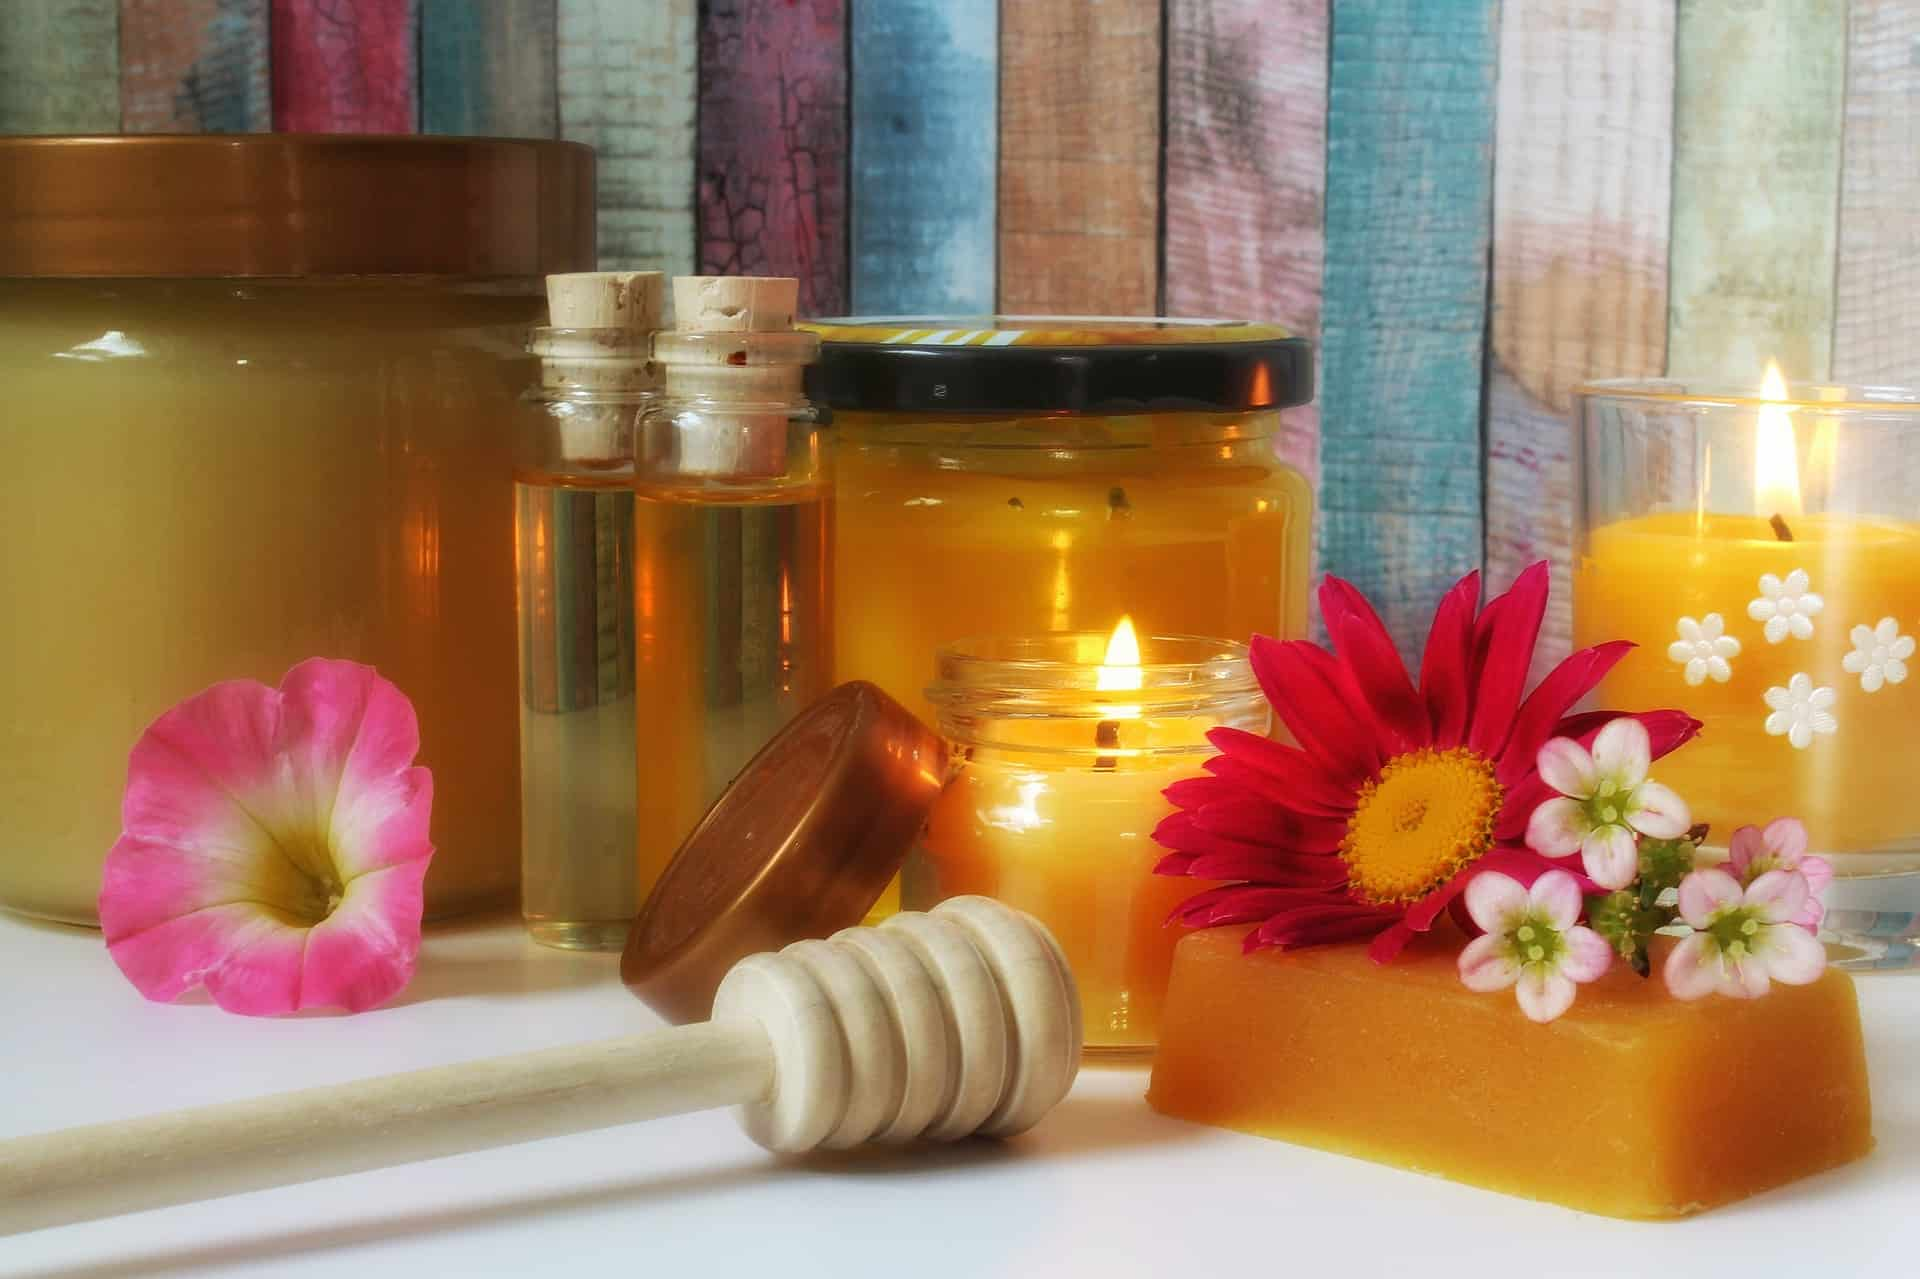 Bienenprodukte (Erzeugnisse der Biene)